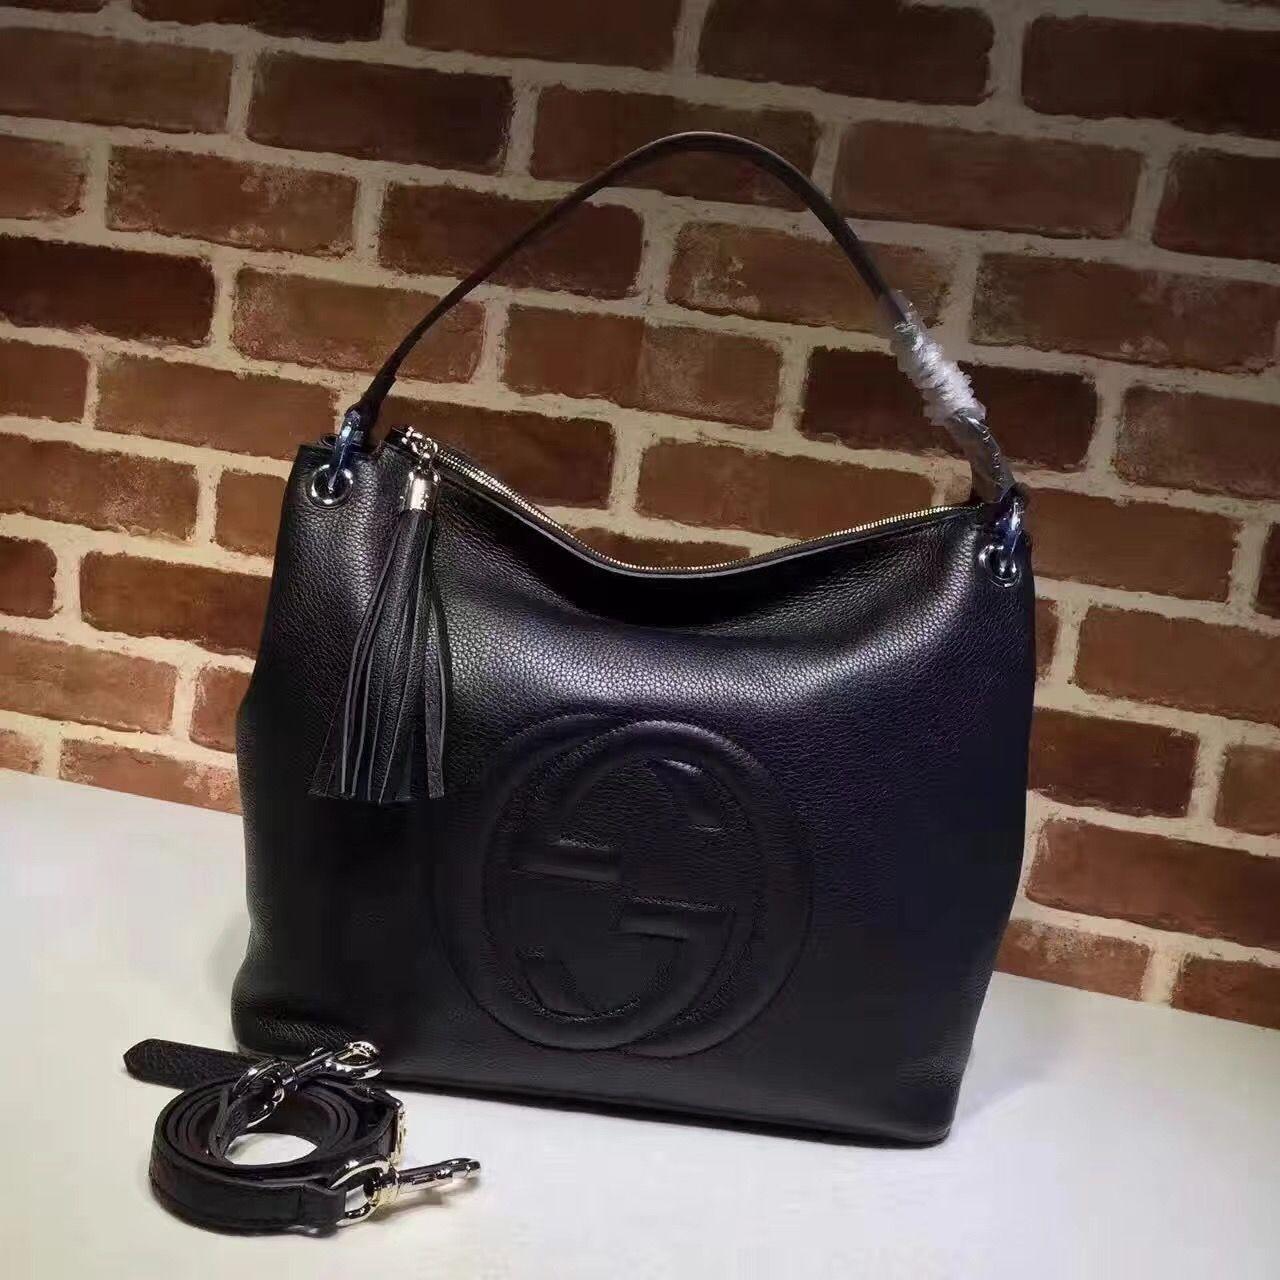 Gucci woman soho hobo bag with strap